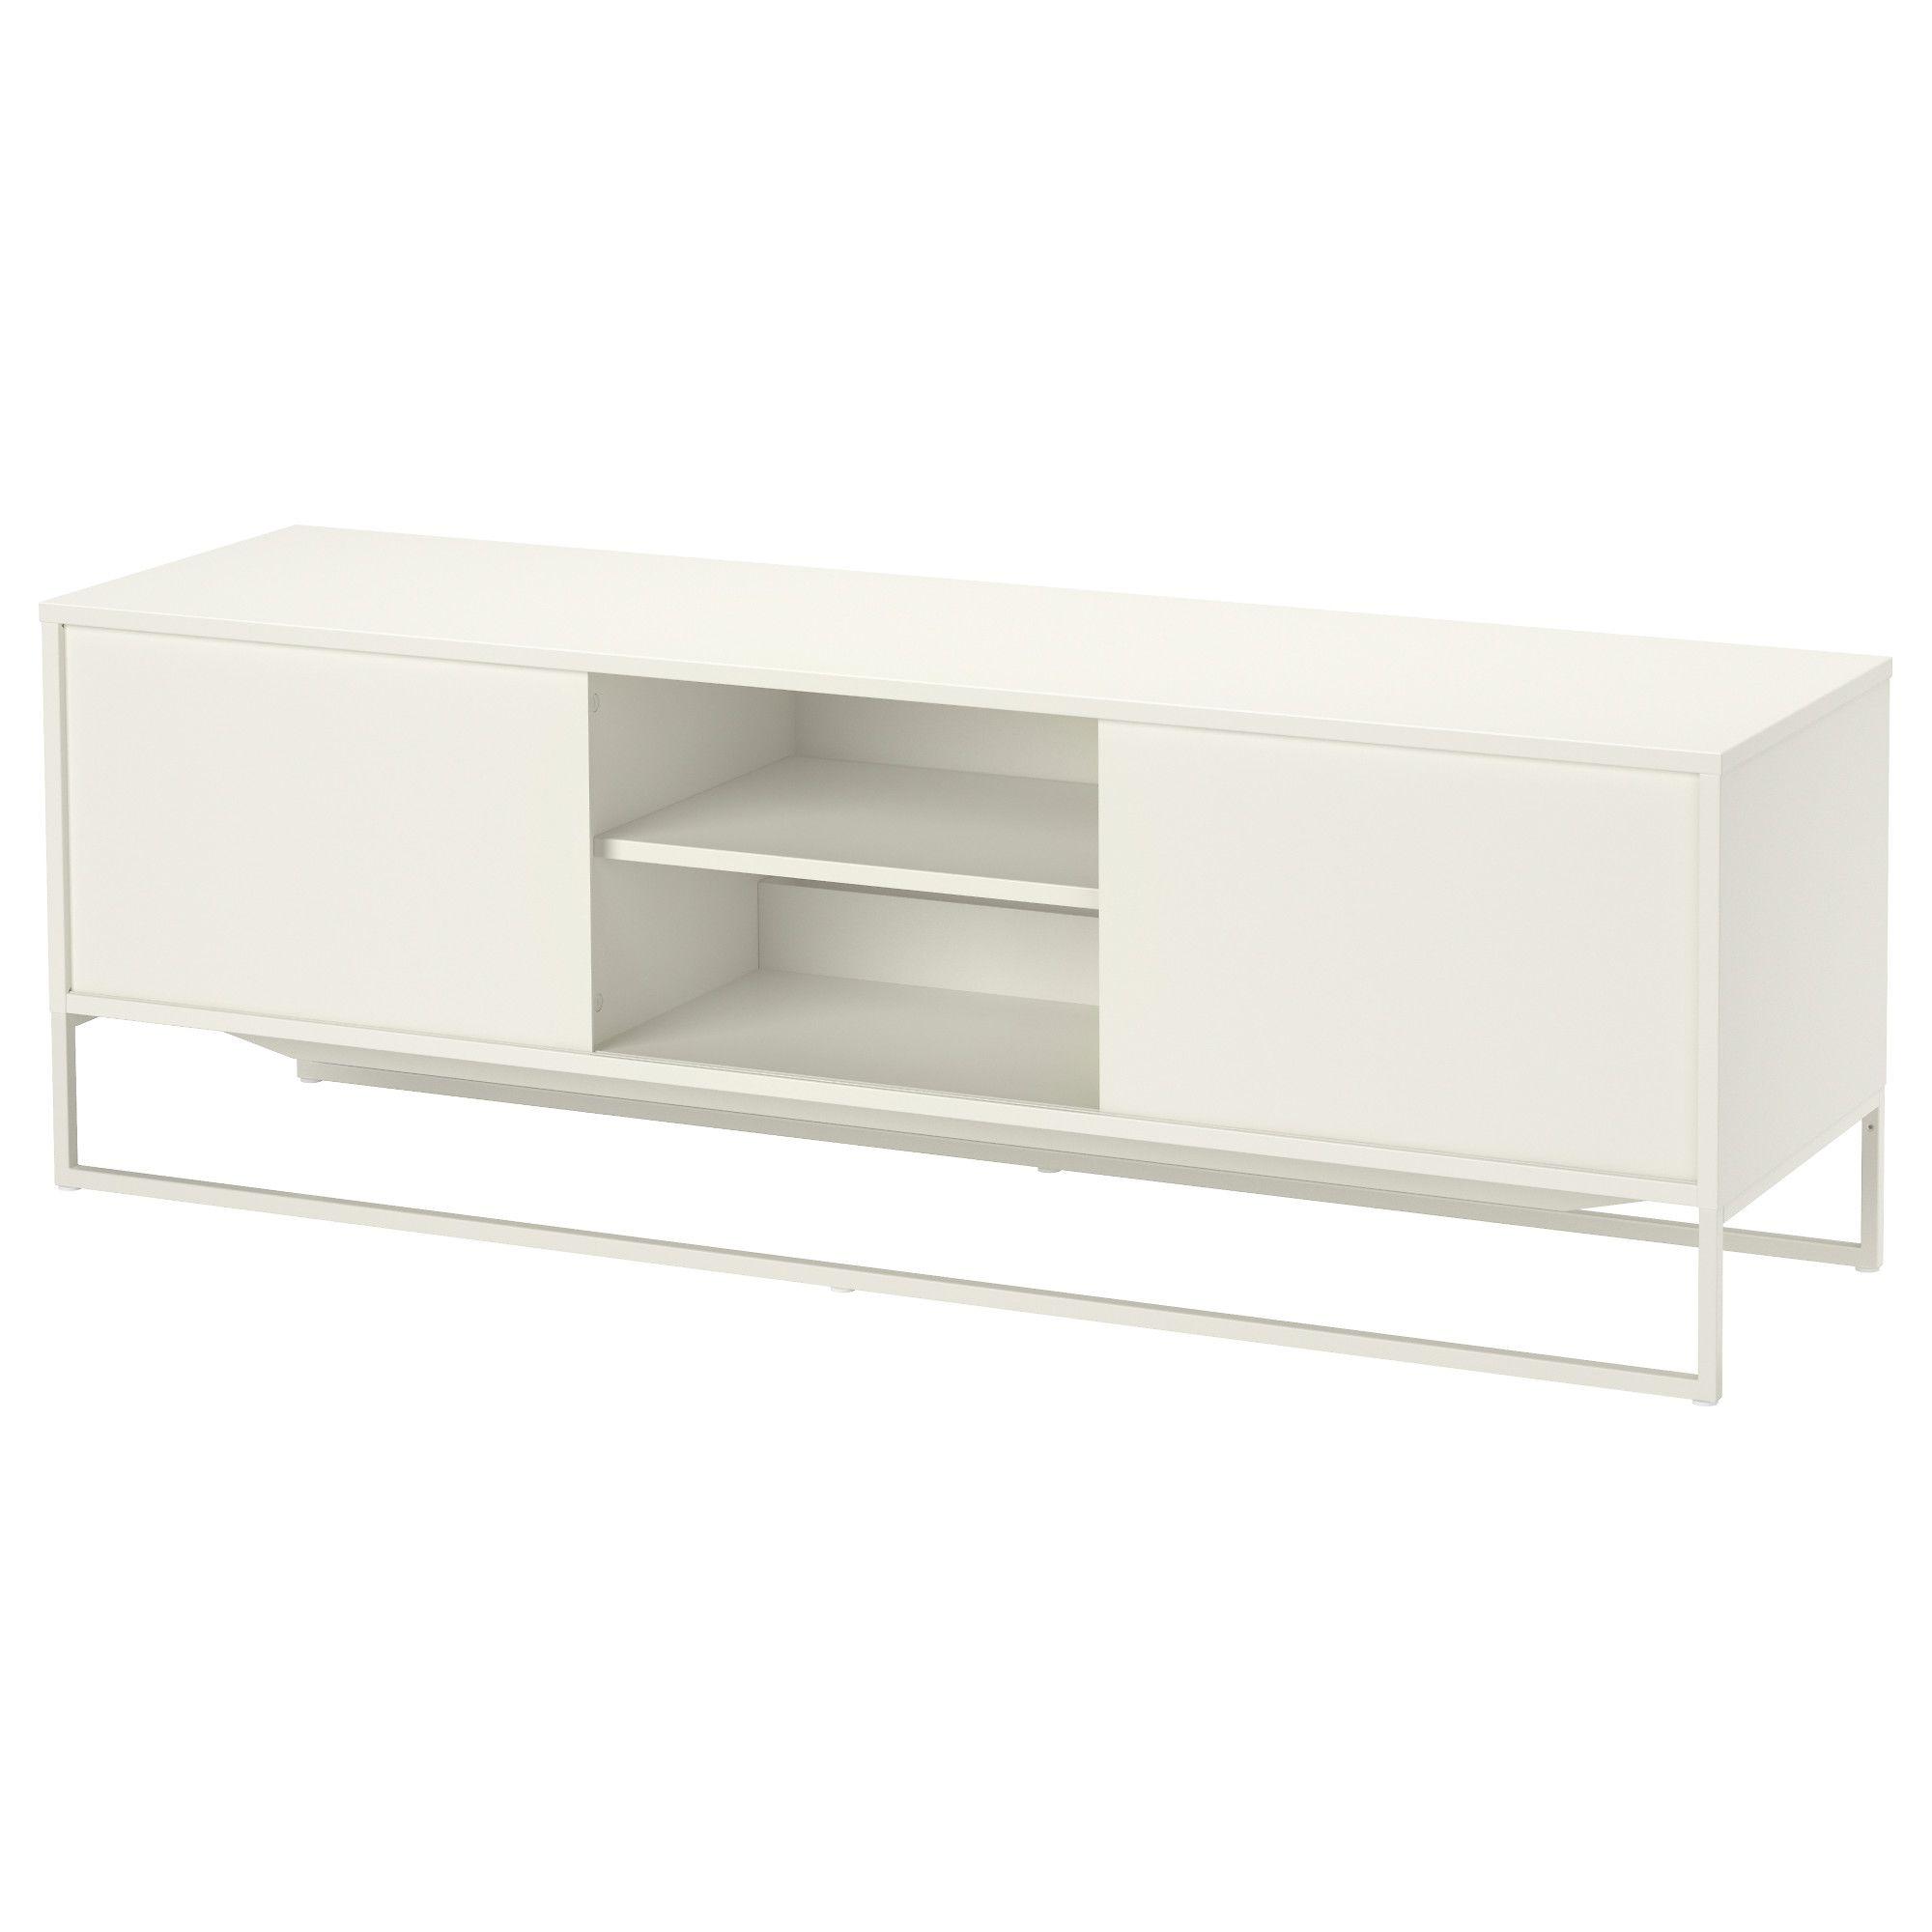 Buffet Blanc Ikea Ikea Ps Meuble Duangle Blancgris Ikea With  # Meuble Tv Scandinave Pied Metal Ikea